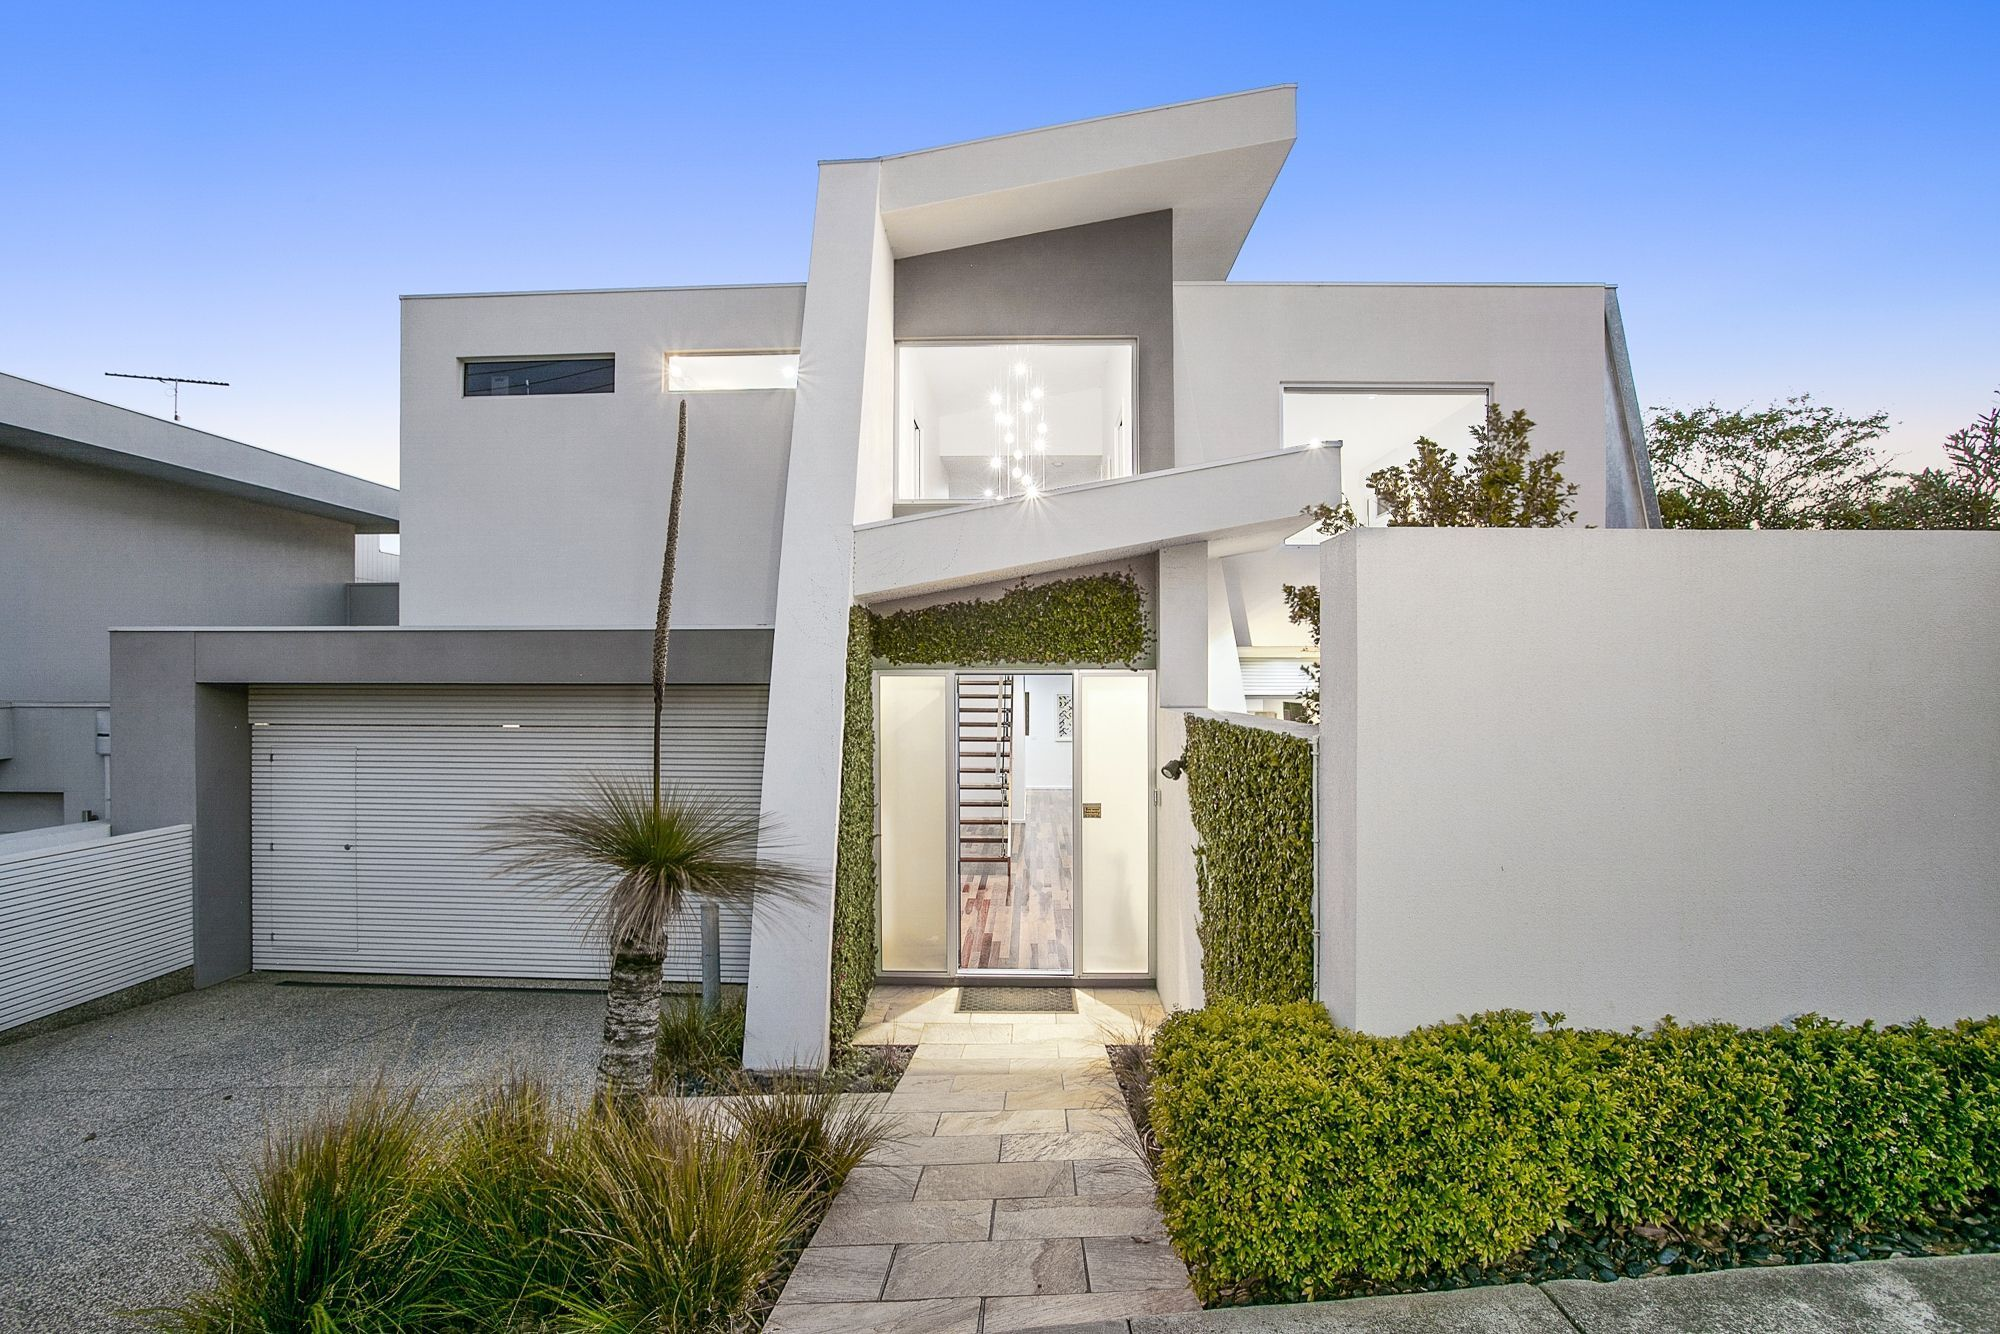 130 The Terrace, Ocean Grove VIC 3226